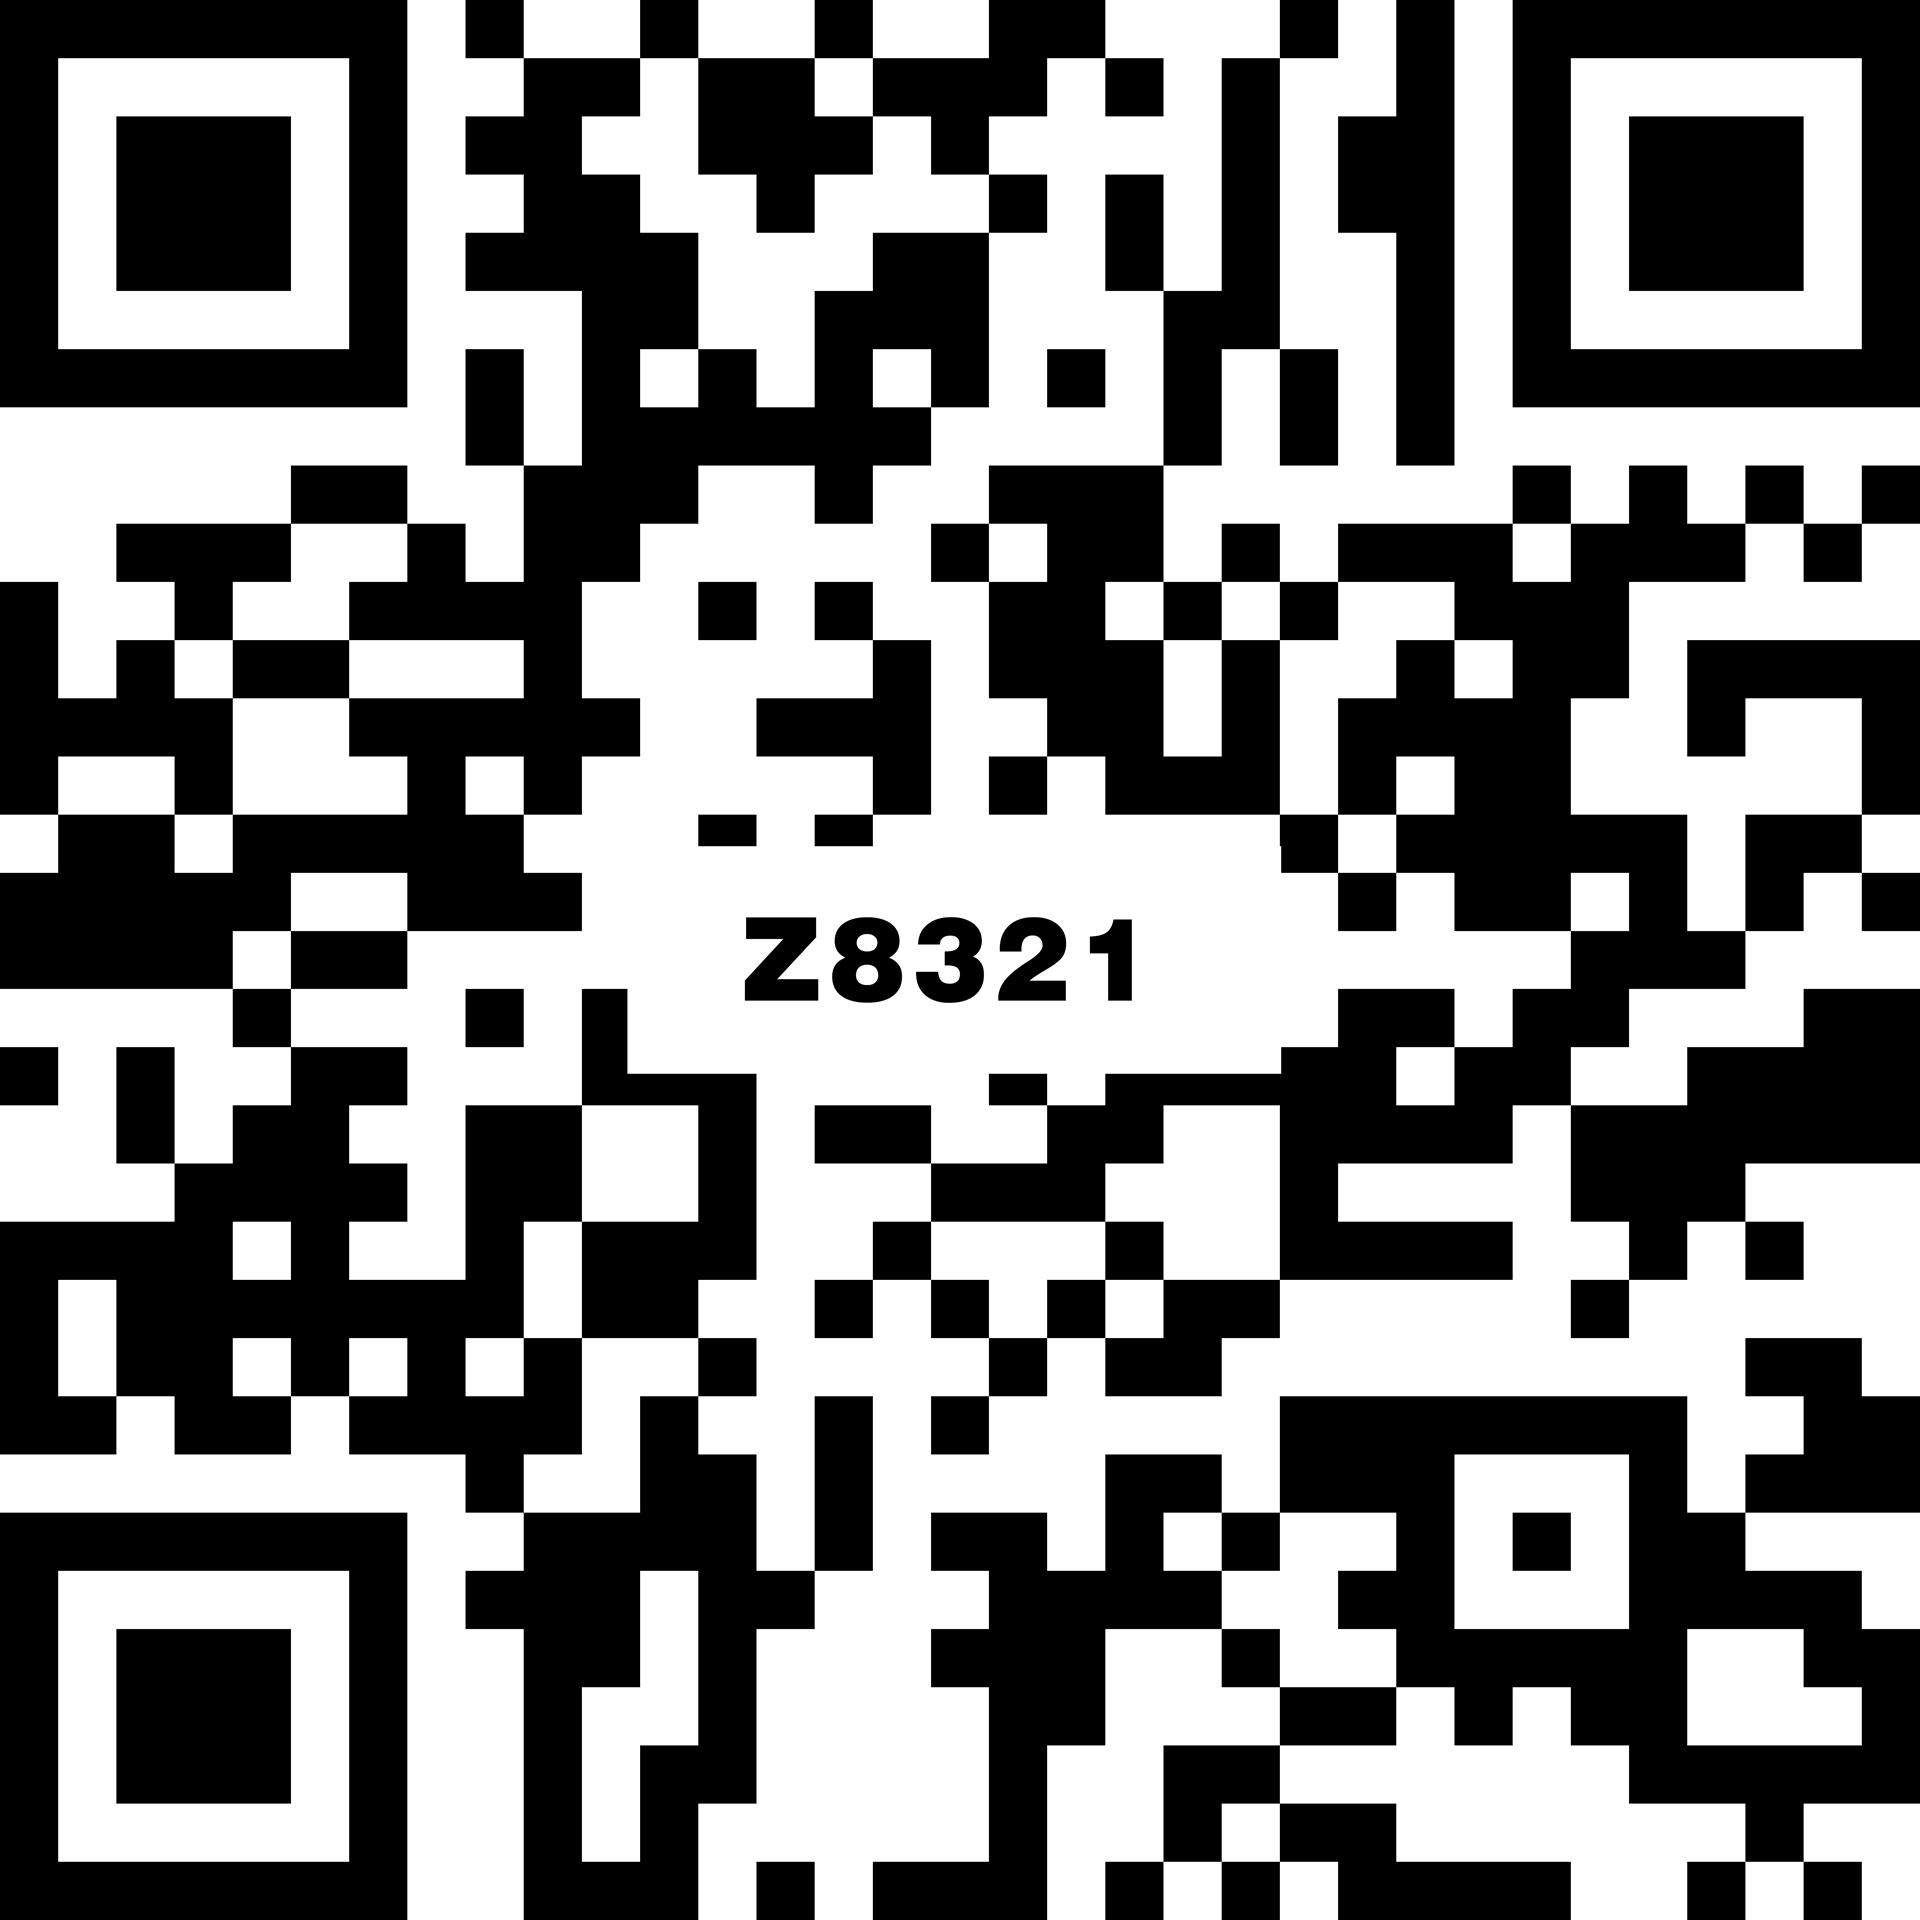 Z8321